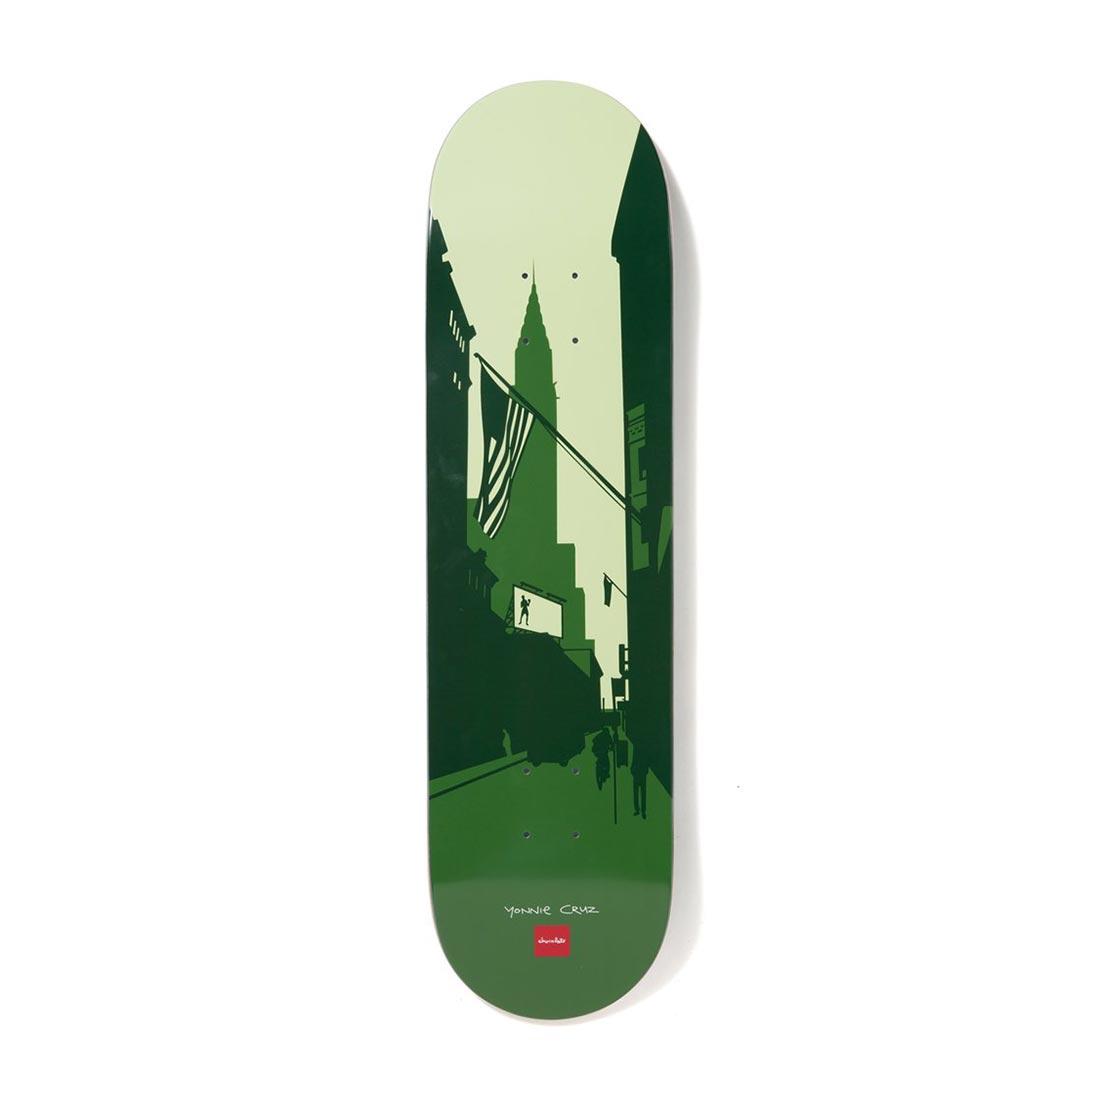 "Chocolate Skateboards The City Series Yonnie Cruz 8.125"" Deck"